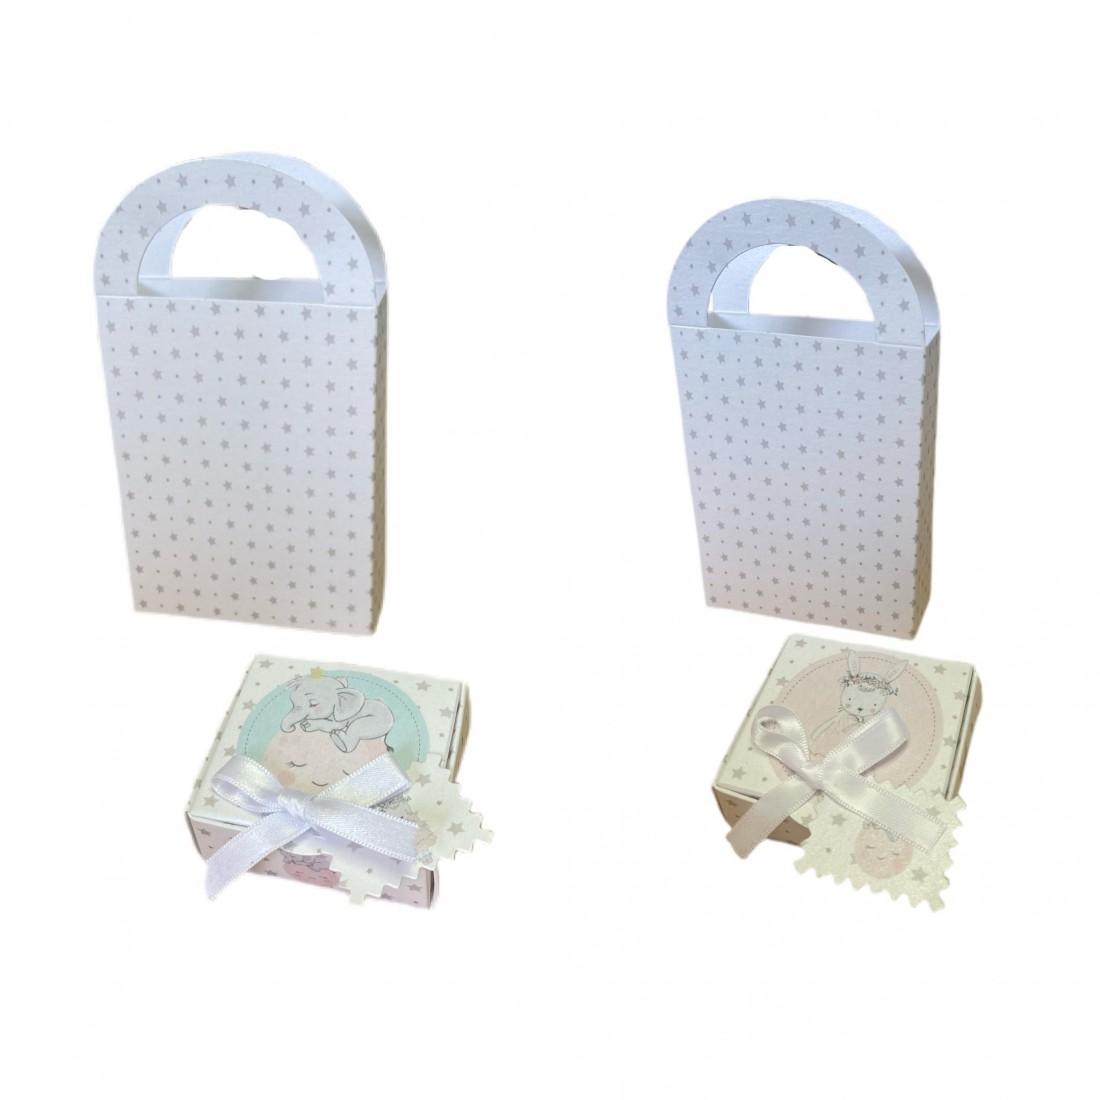 Kit Box + Bag Elephant and Rabbit